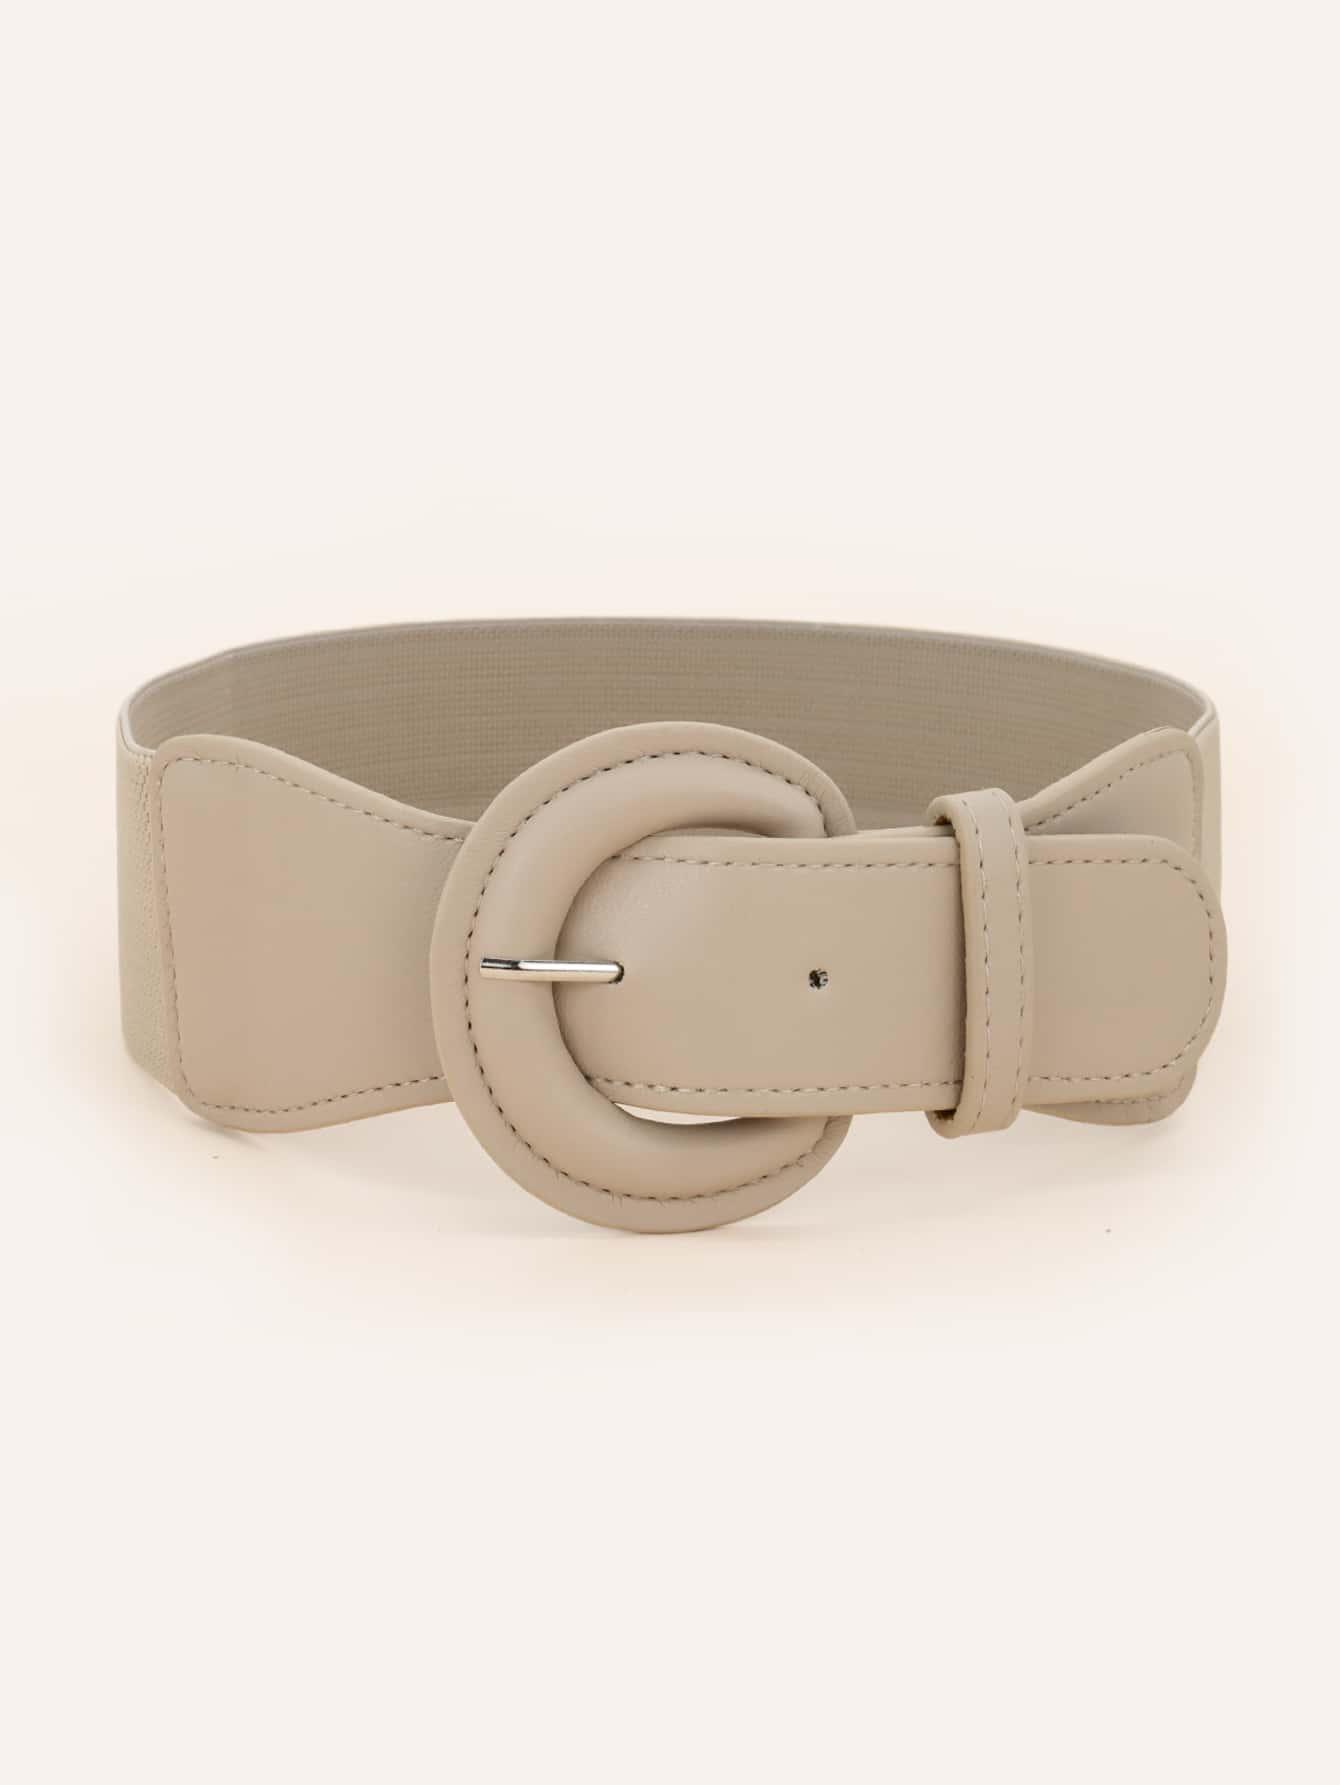 Plus Size Belt thumbnail